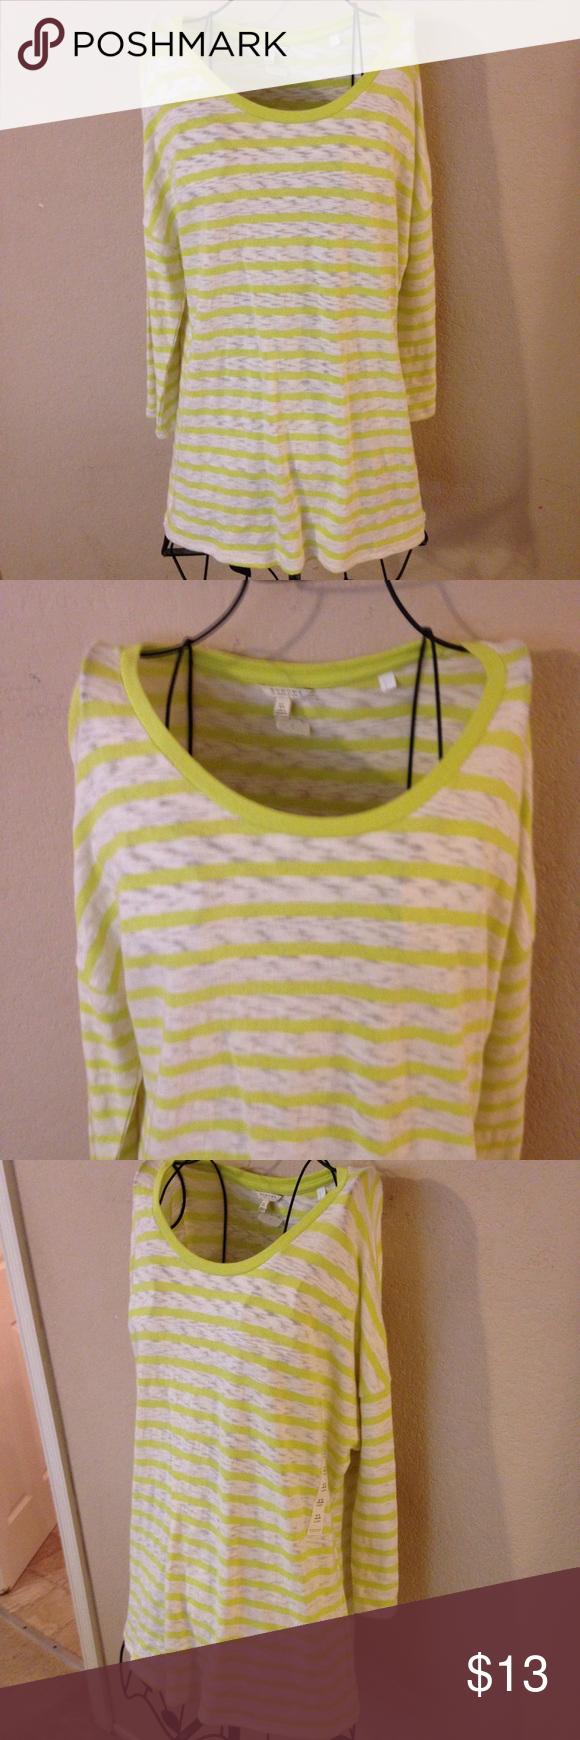 Cute light weight tunic sweater size XL look | Tunic sweater ...